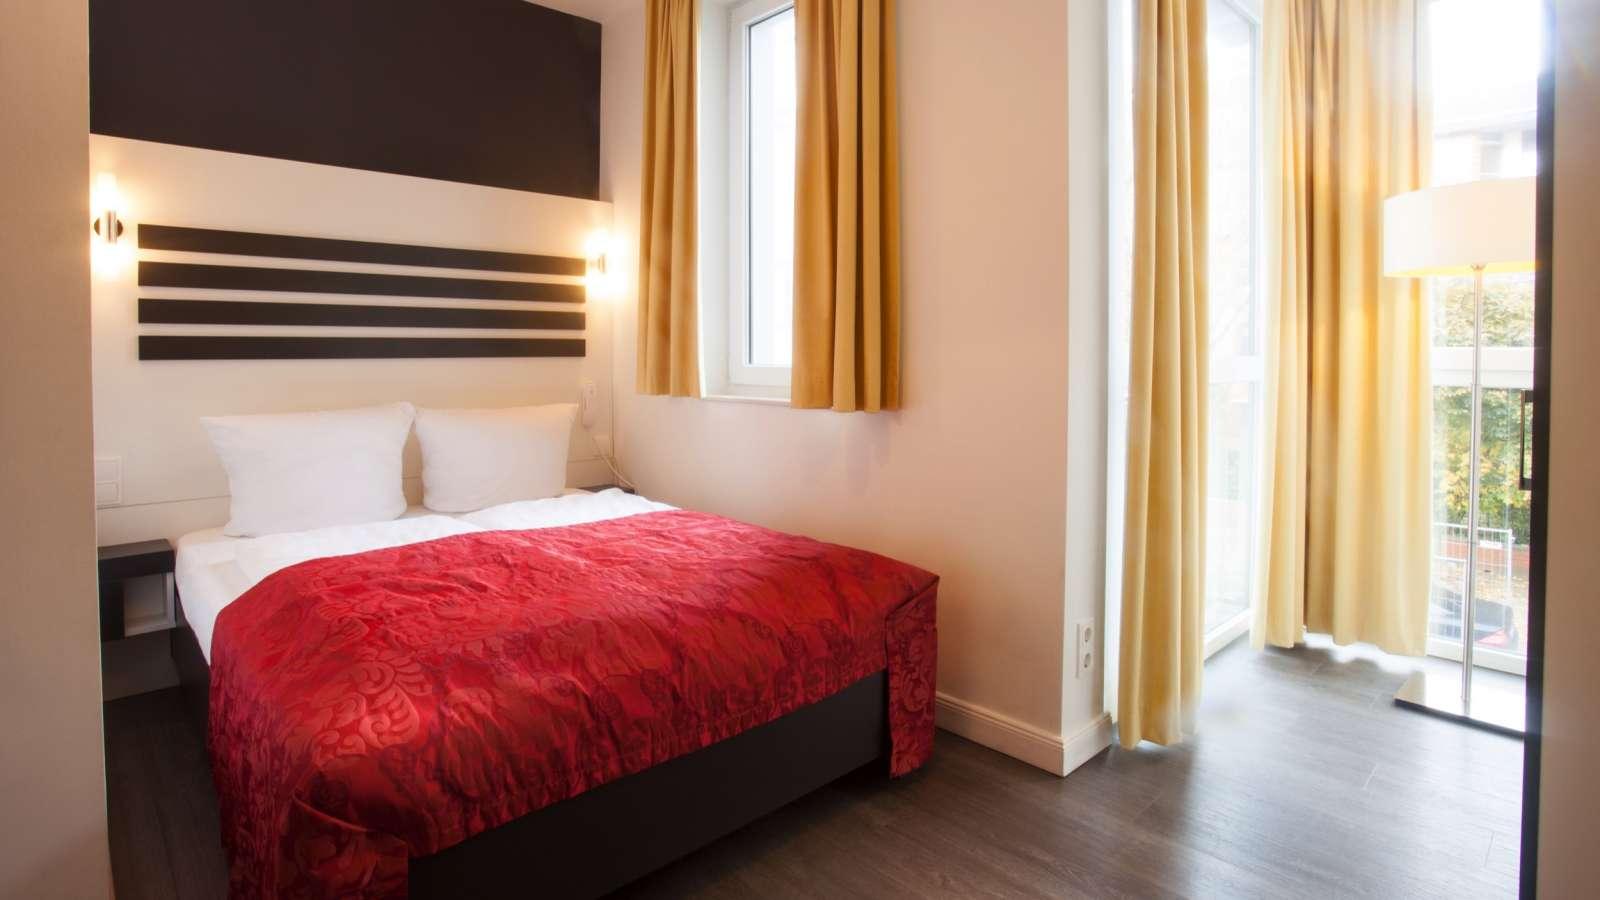 centro hotels hamburg. Black Bedroom Furniture Sets. Home Design Ideas